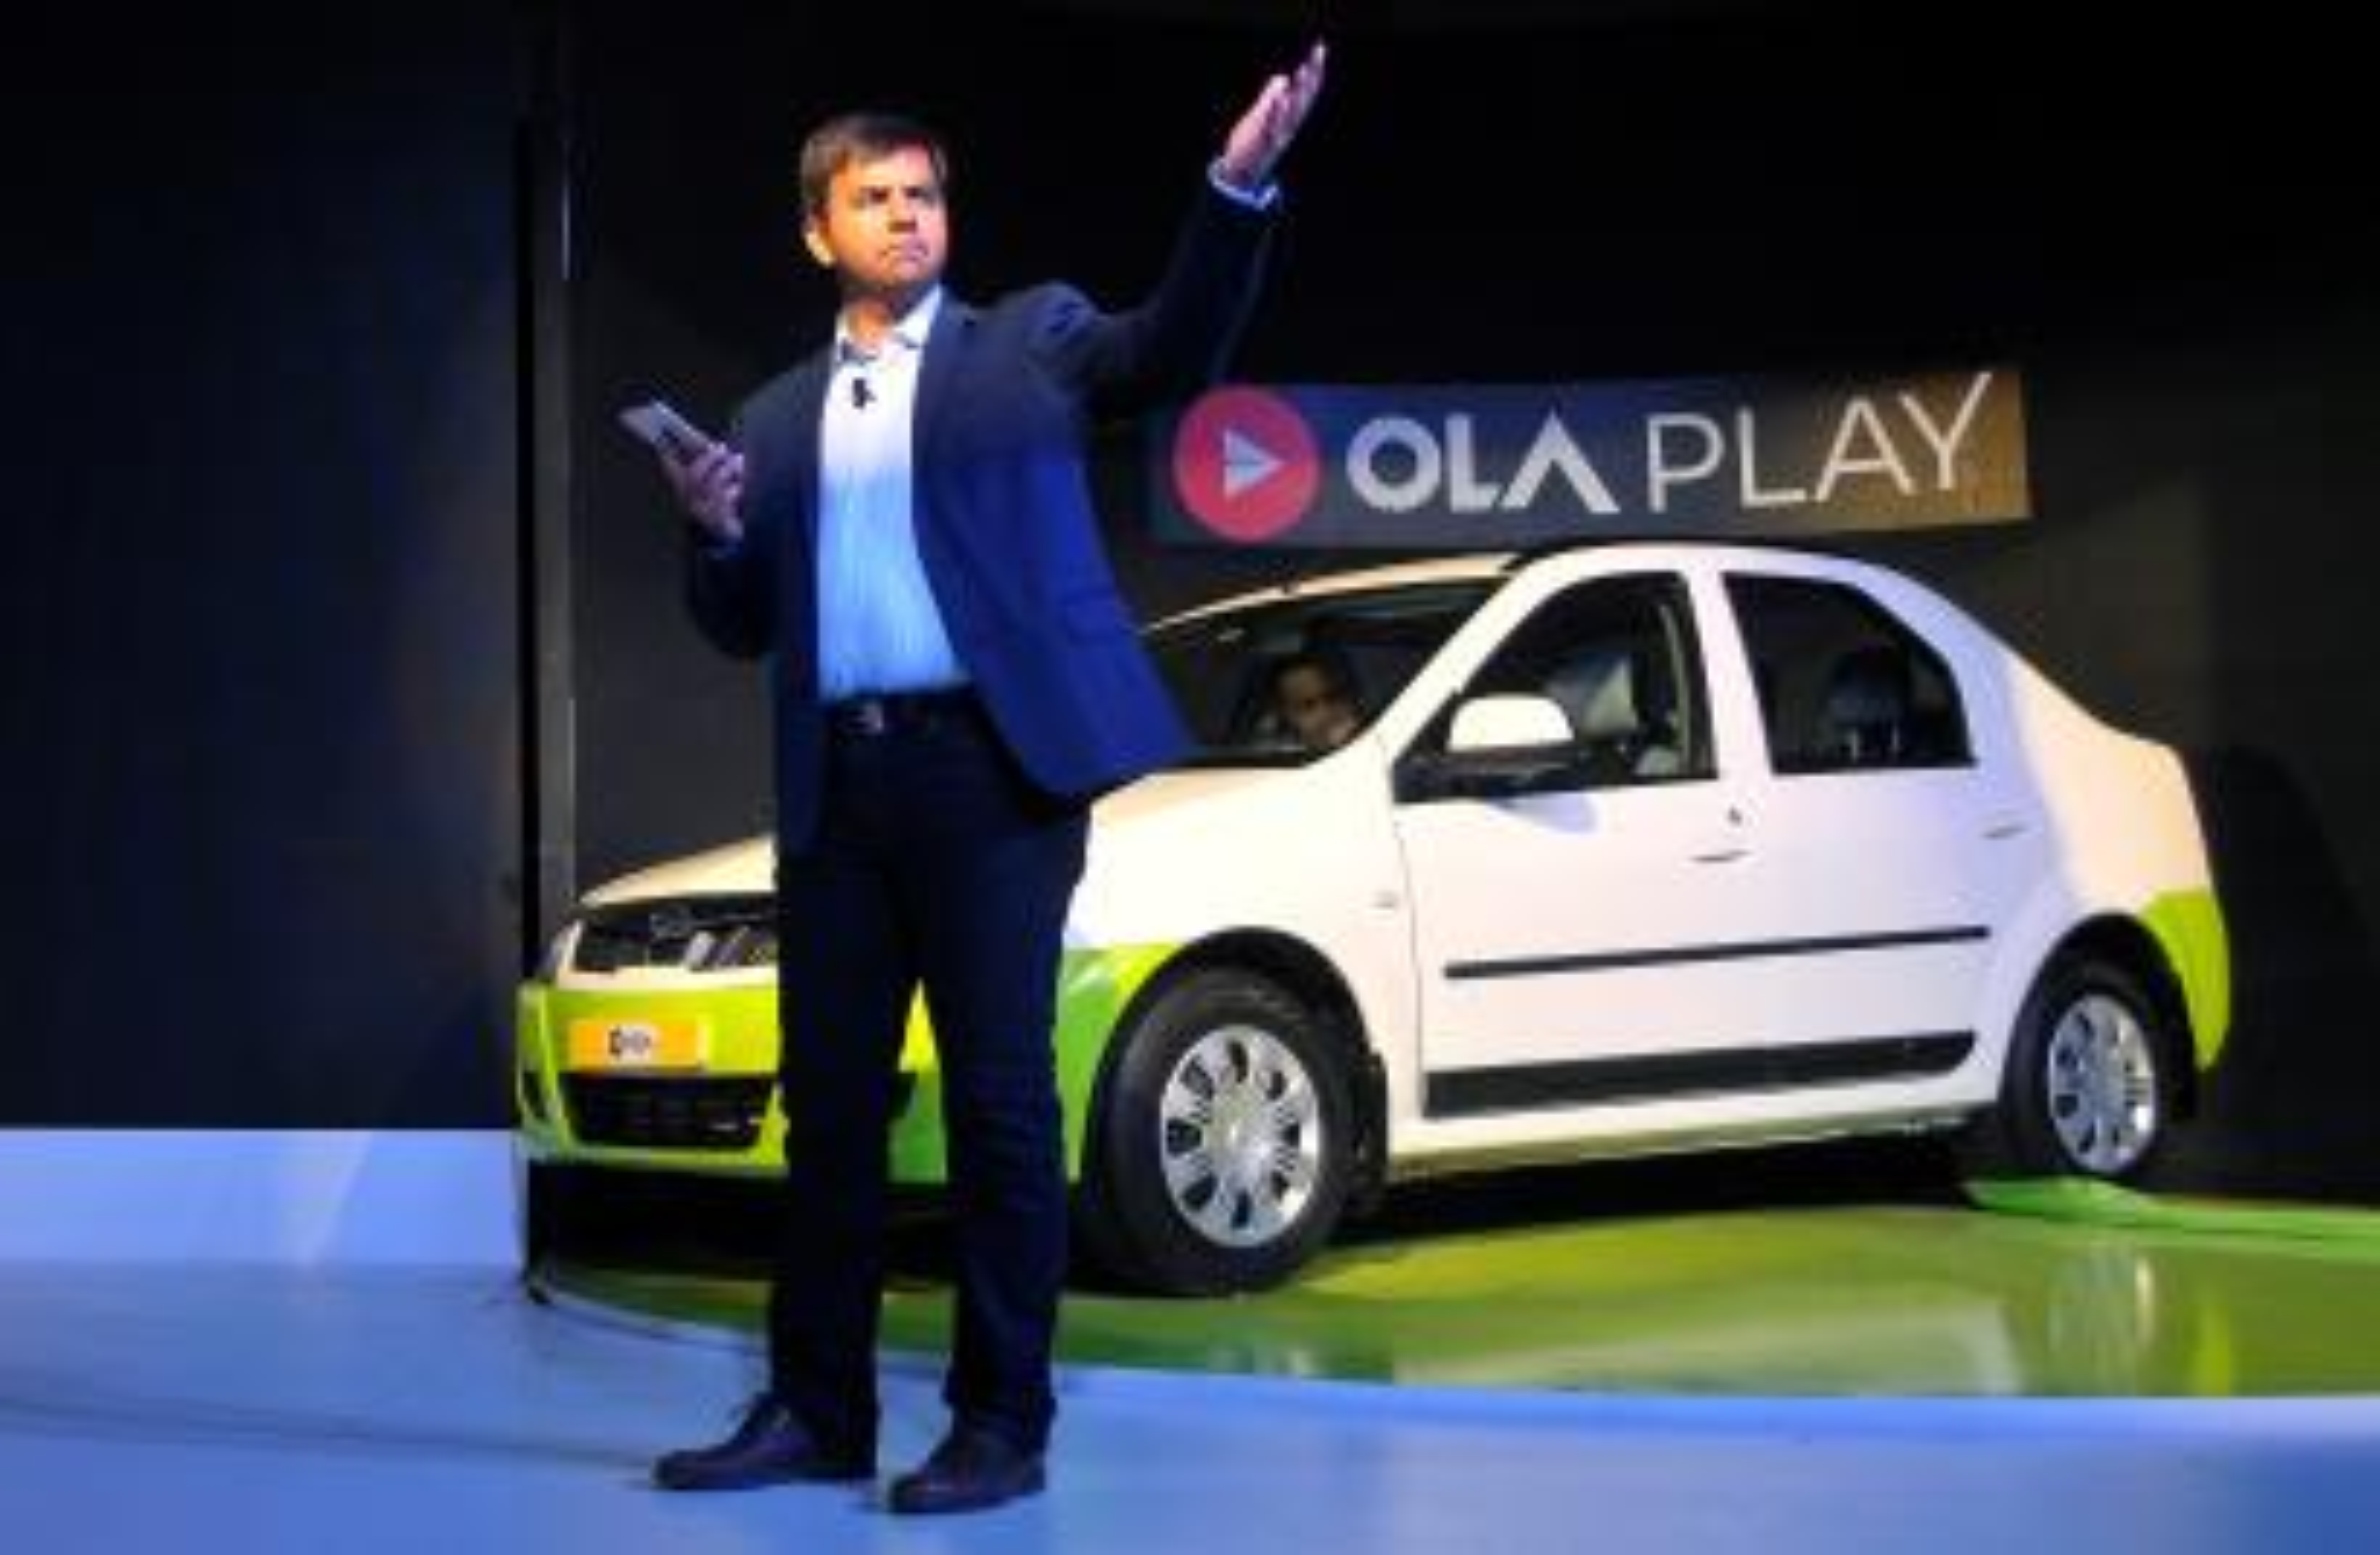 Bhavish Aggarwal, CEO and co-founder of Ola